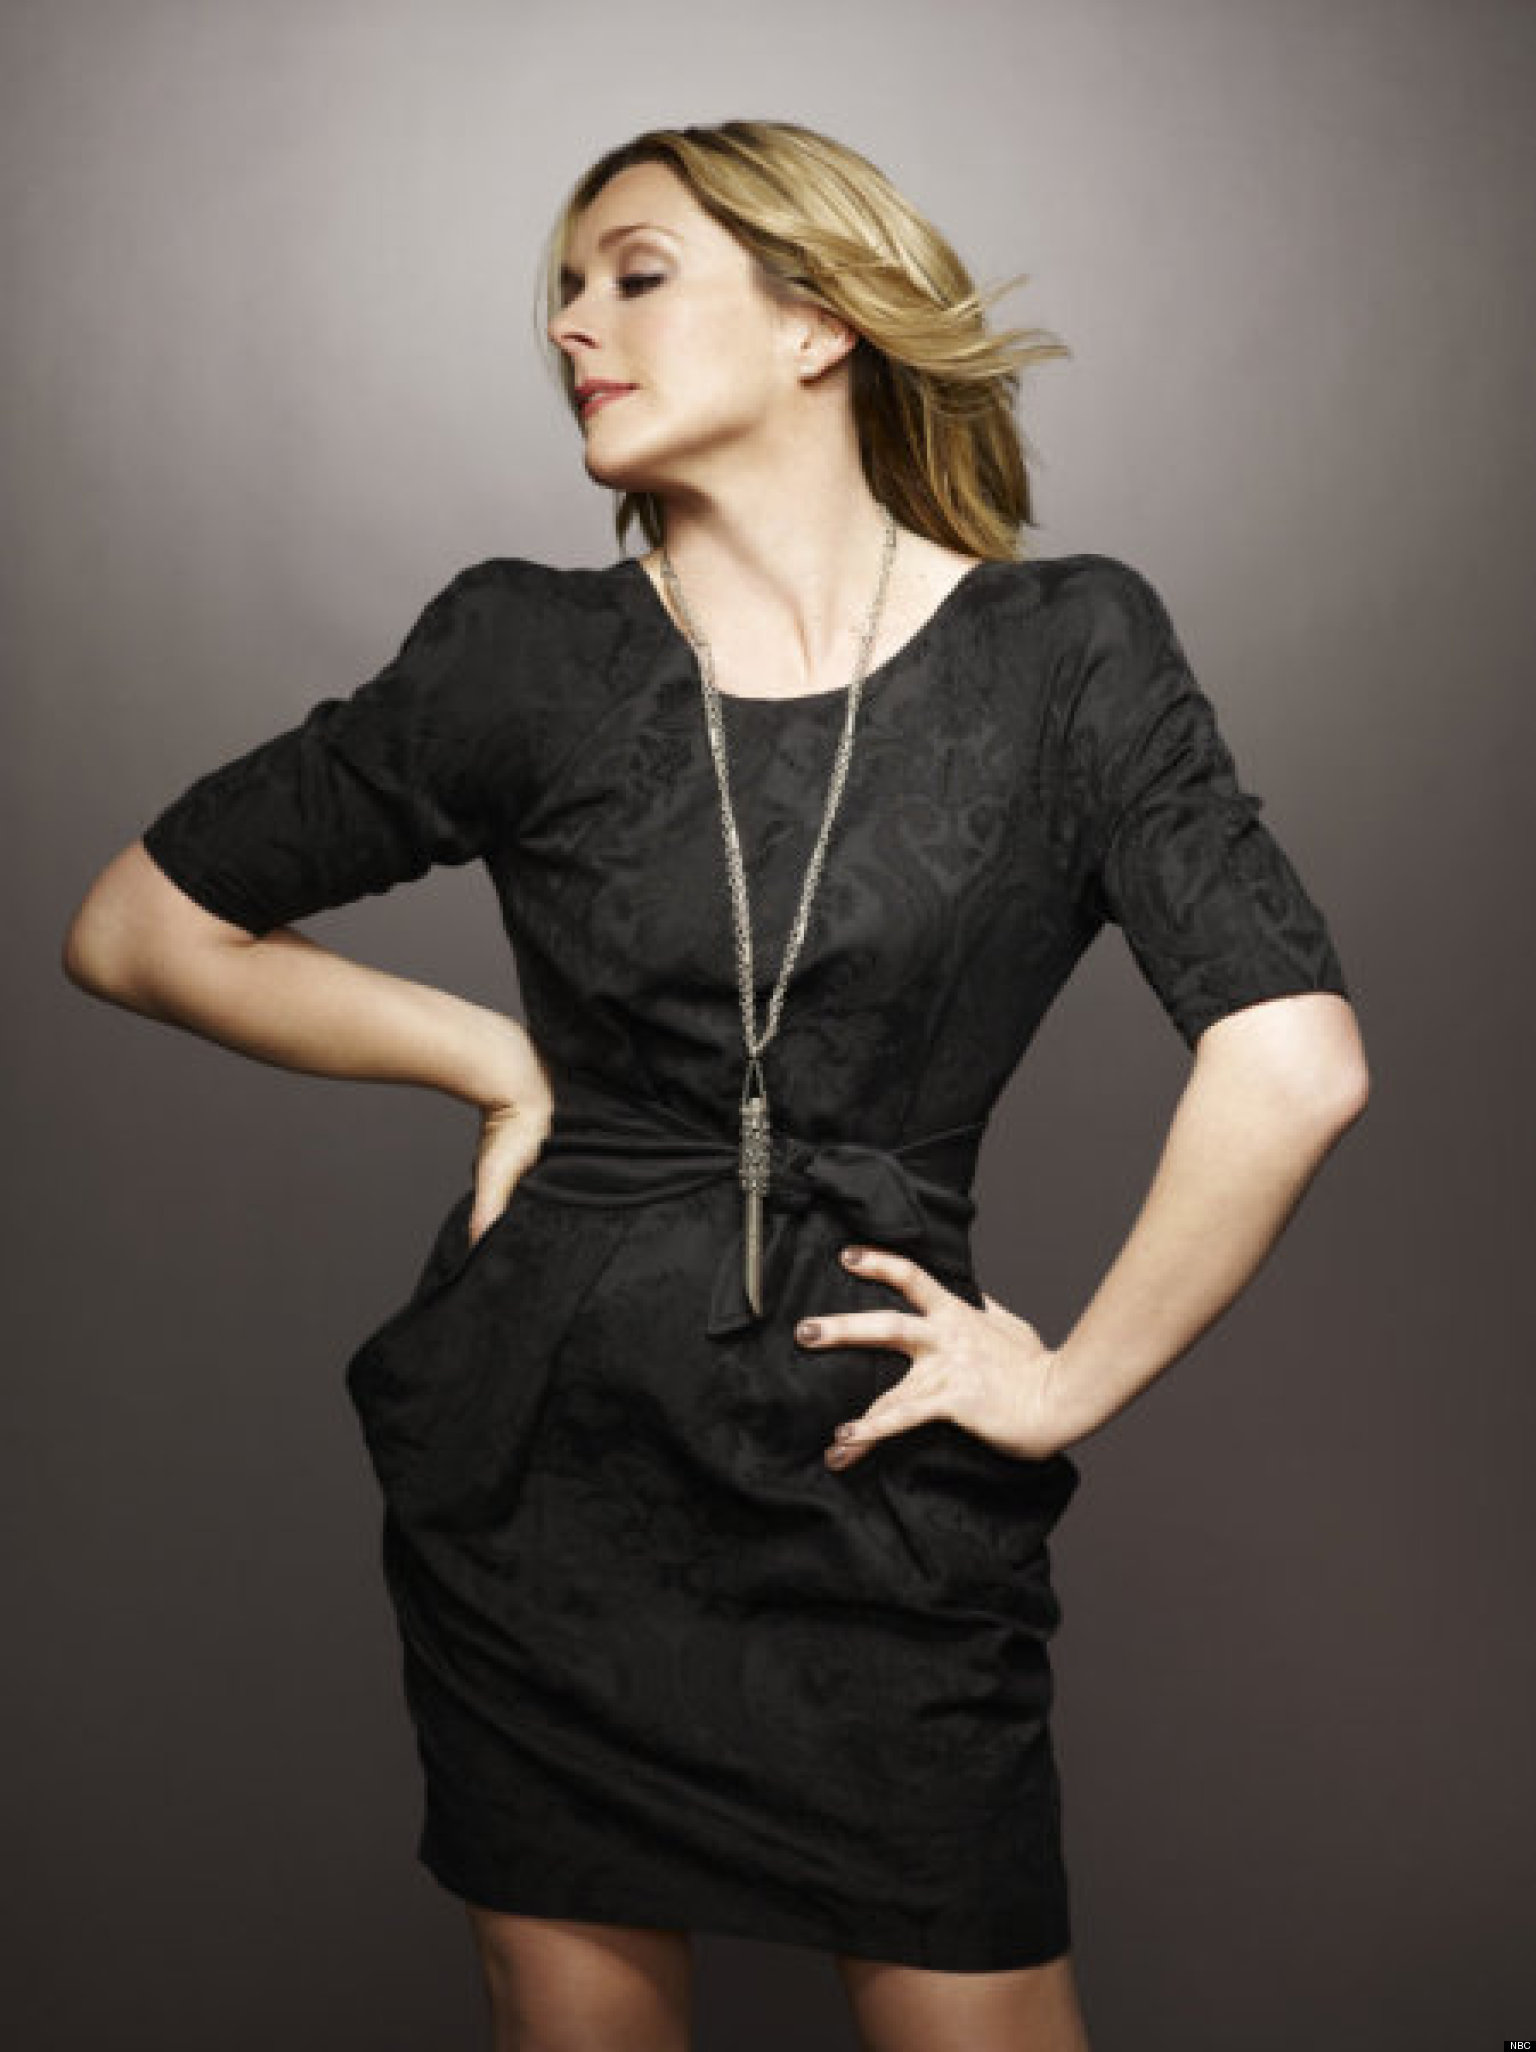 Goodbye 30 Rock Part 2: The Best Jenna Maroney Songs